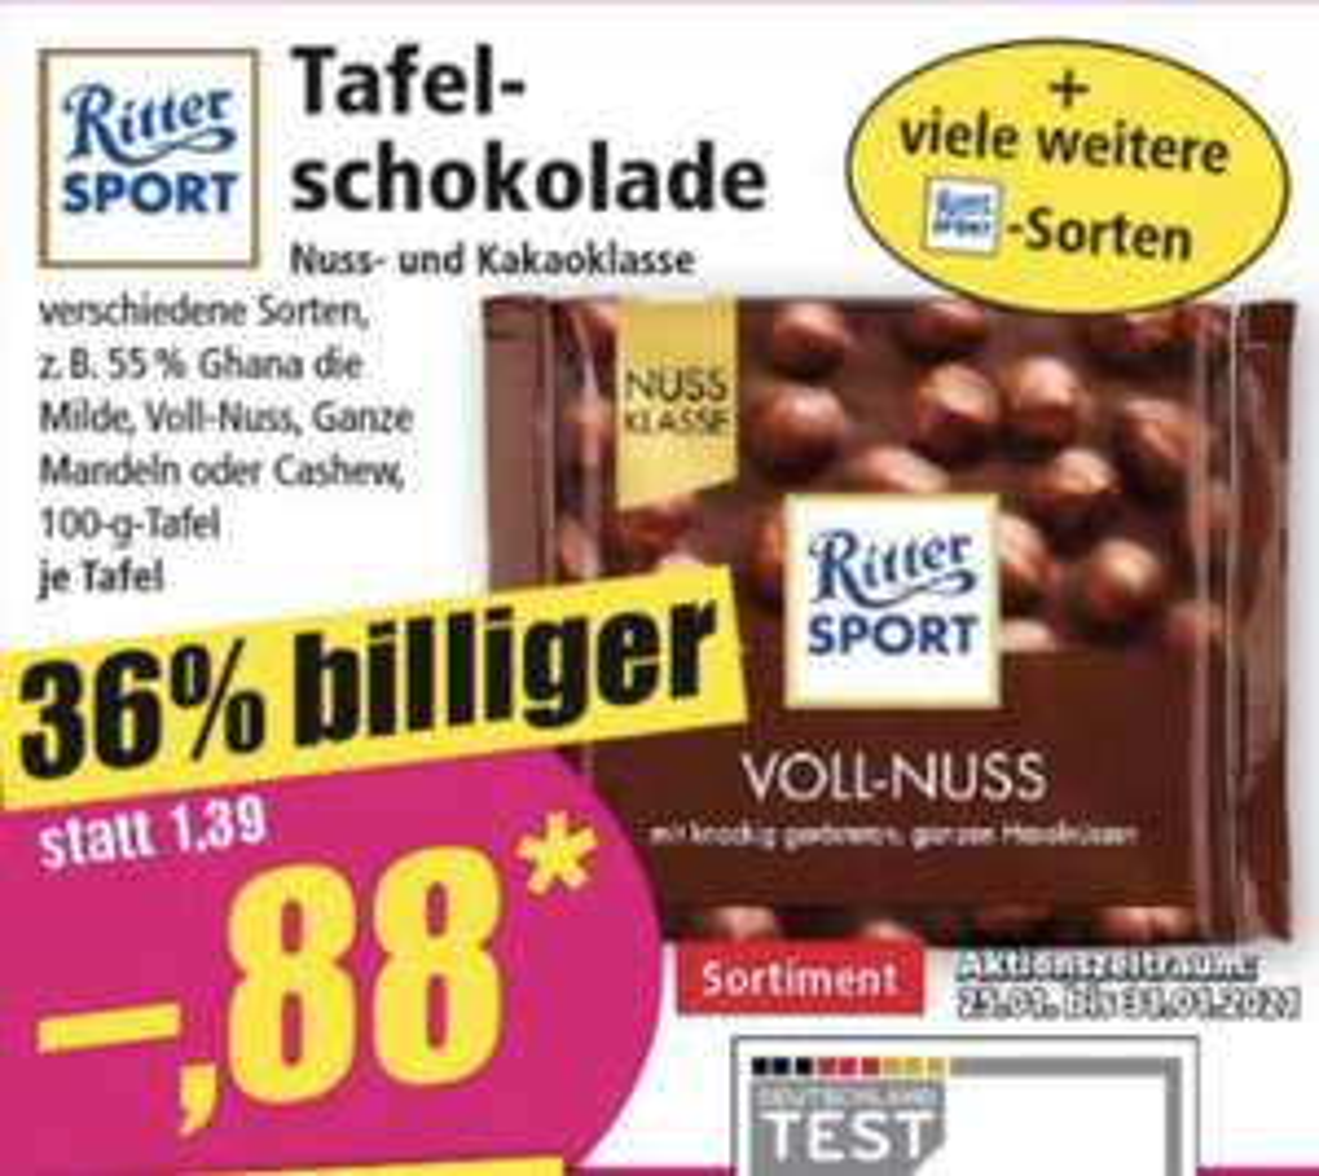 NORMA: Ritter Sport Nussklasse und Kakaoklasse 0,88